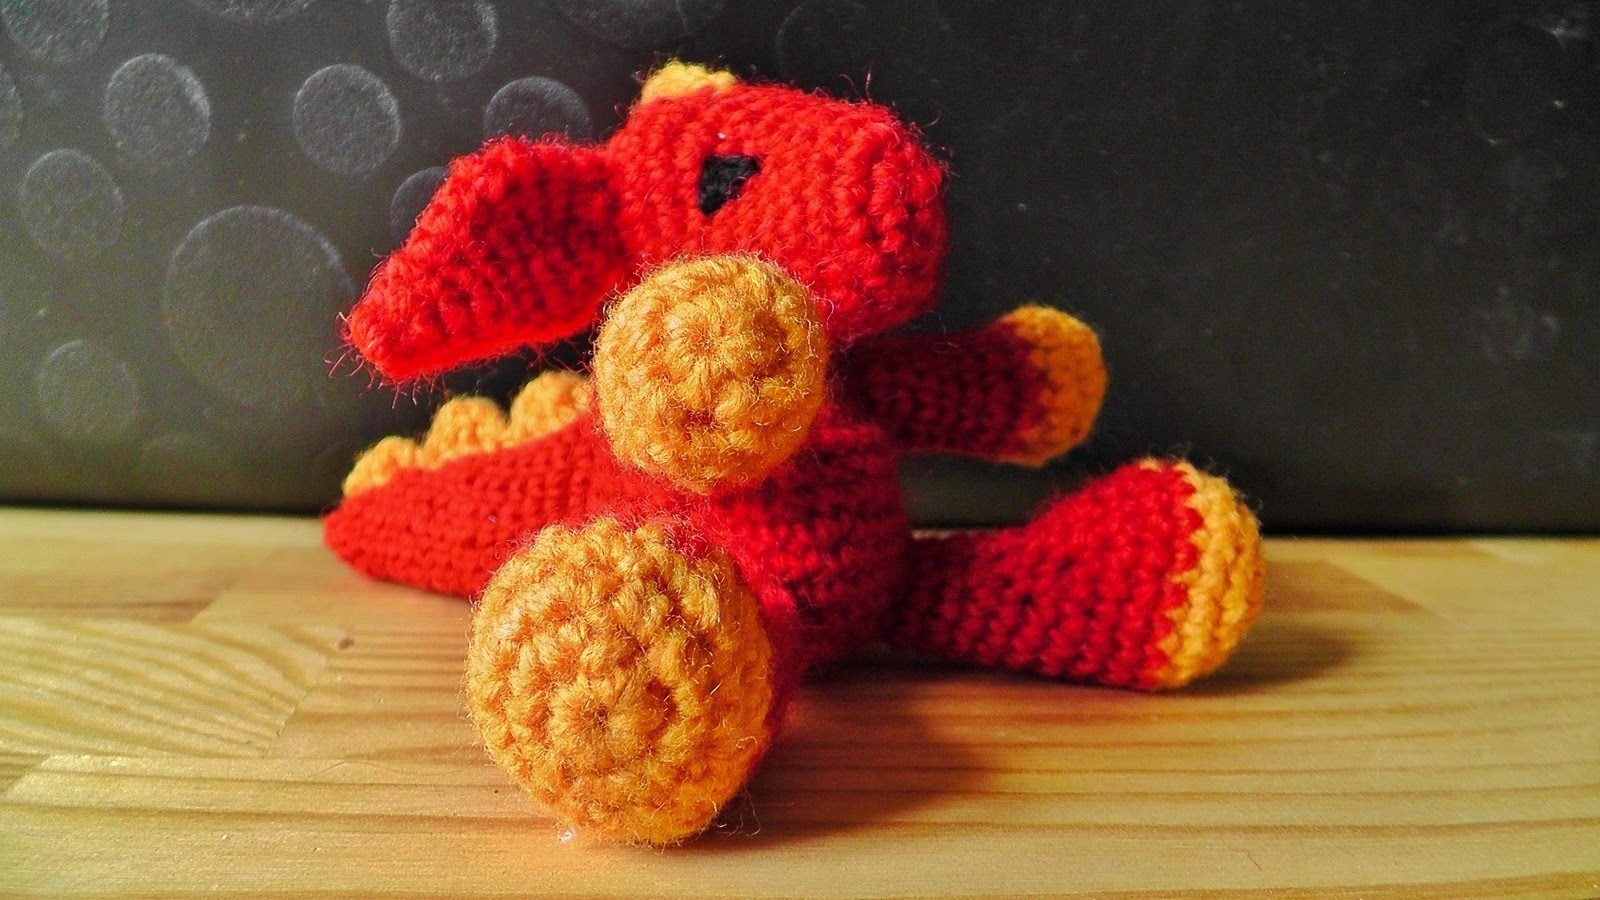 Amigurumi dragon crochet pattern part 1